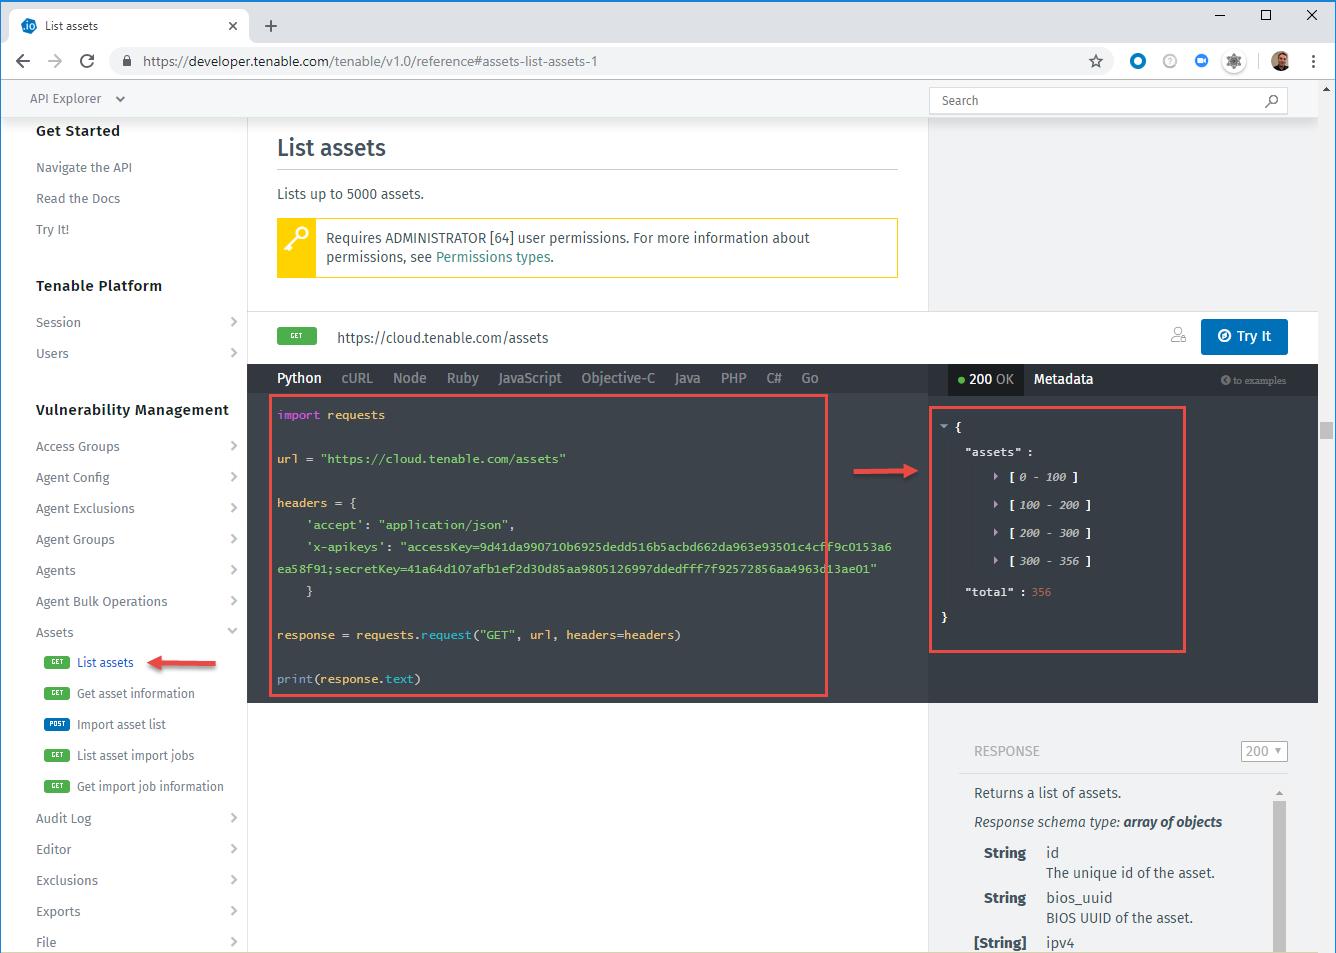 API Explorer API Key